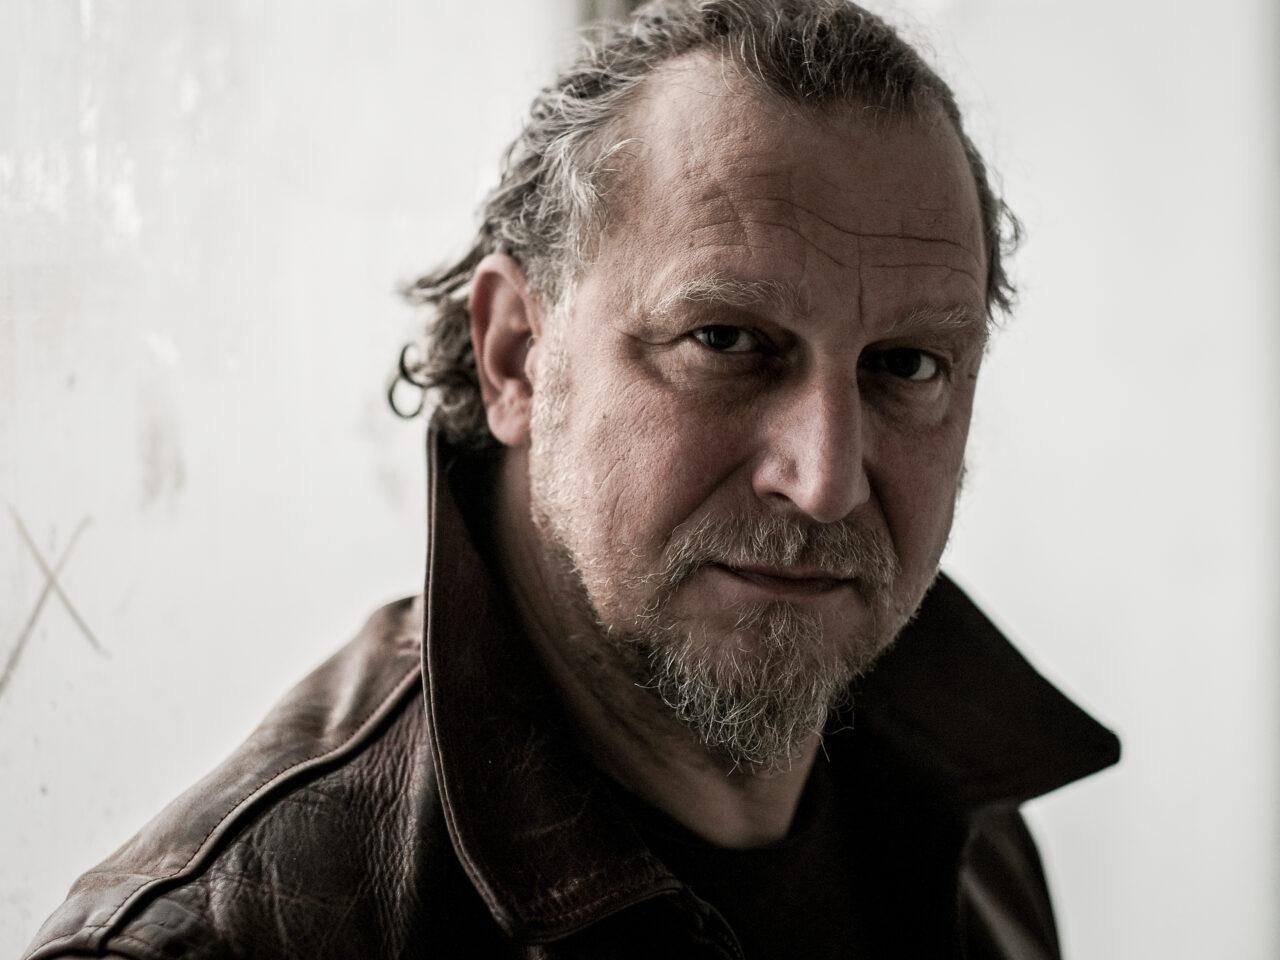 Markus Hurek